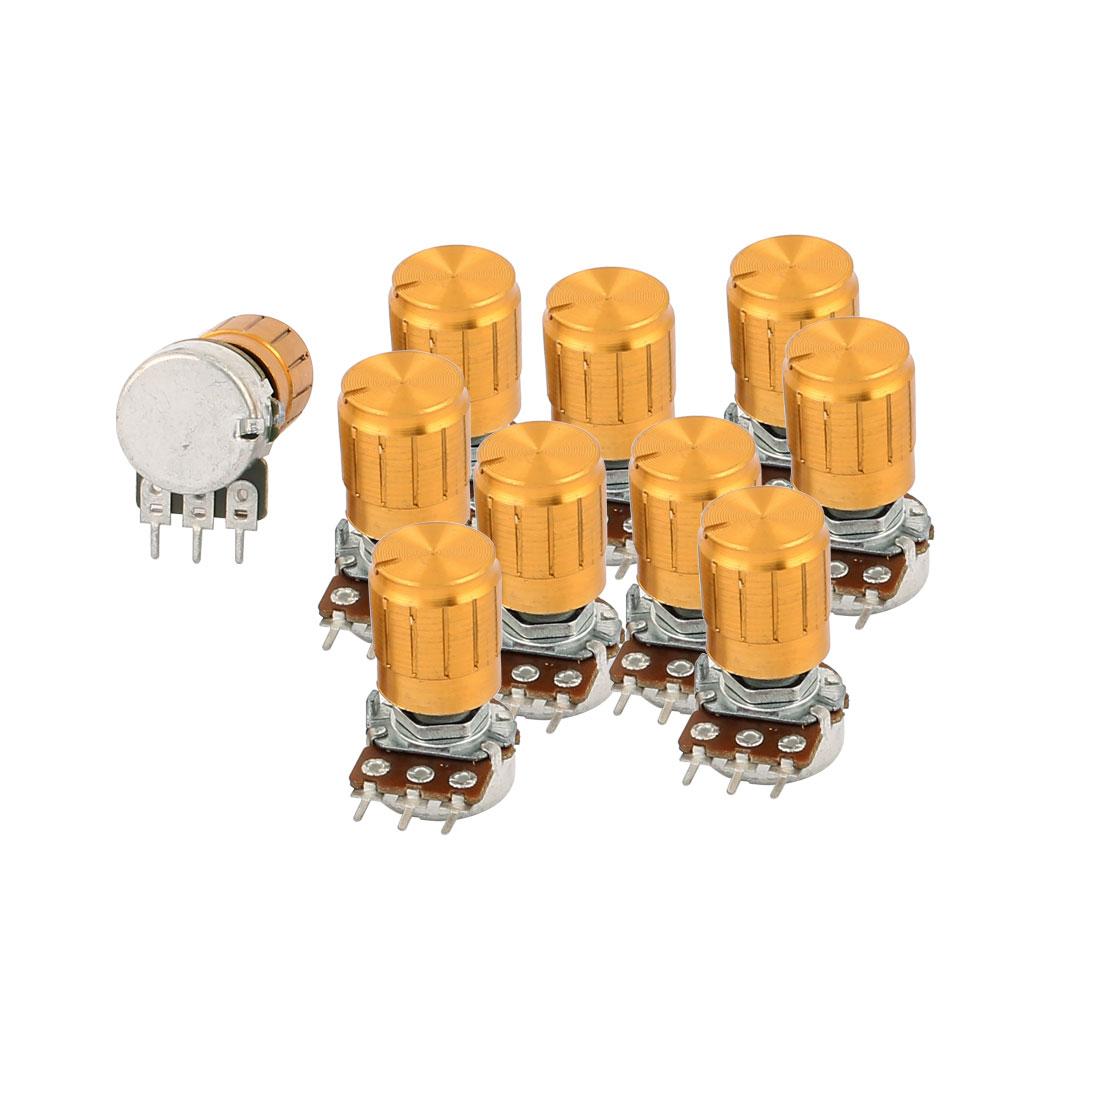 10Pcs B500K 500K Ohm Rotating Shaft 3 Terminals Linear Taper Rotary Potentiometer w Knob